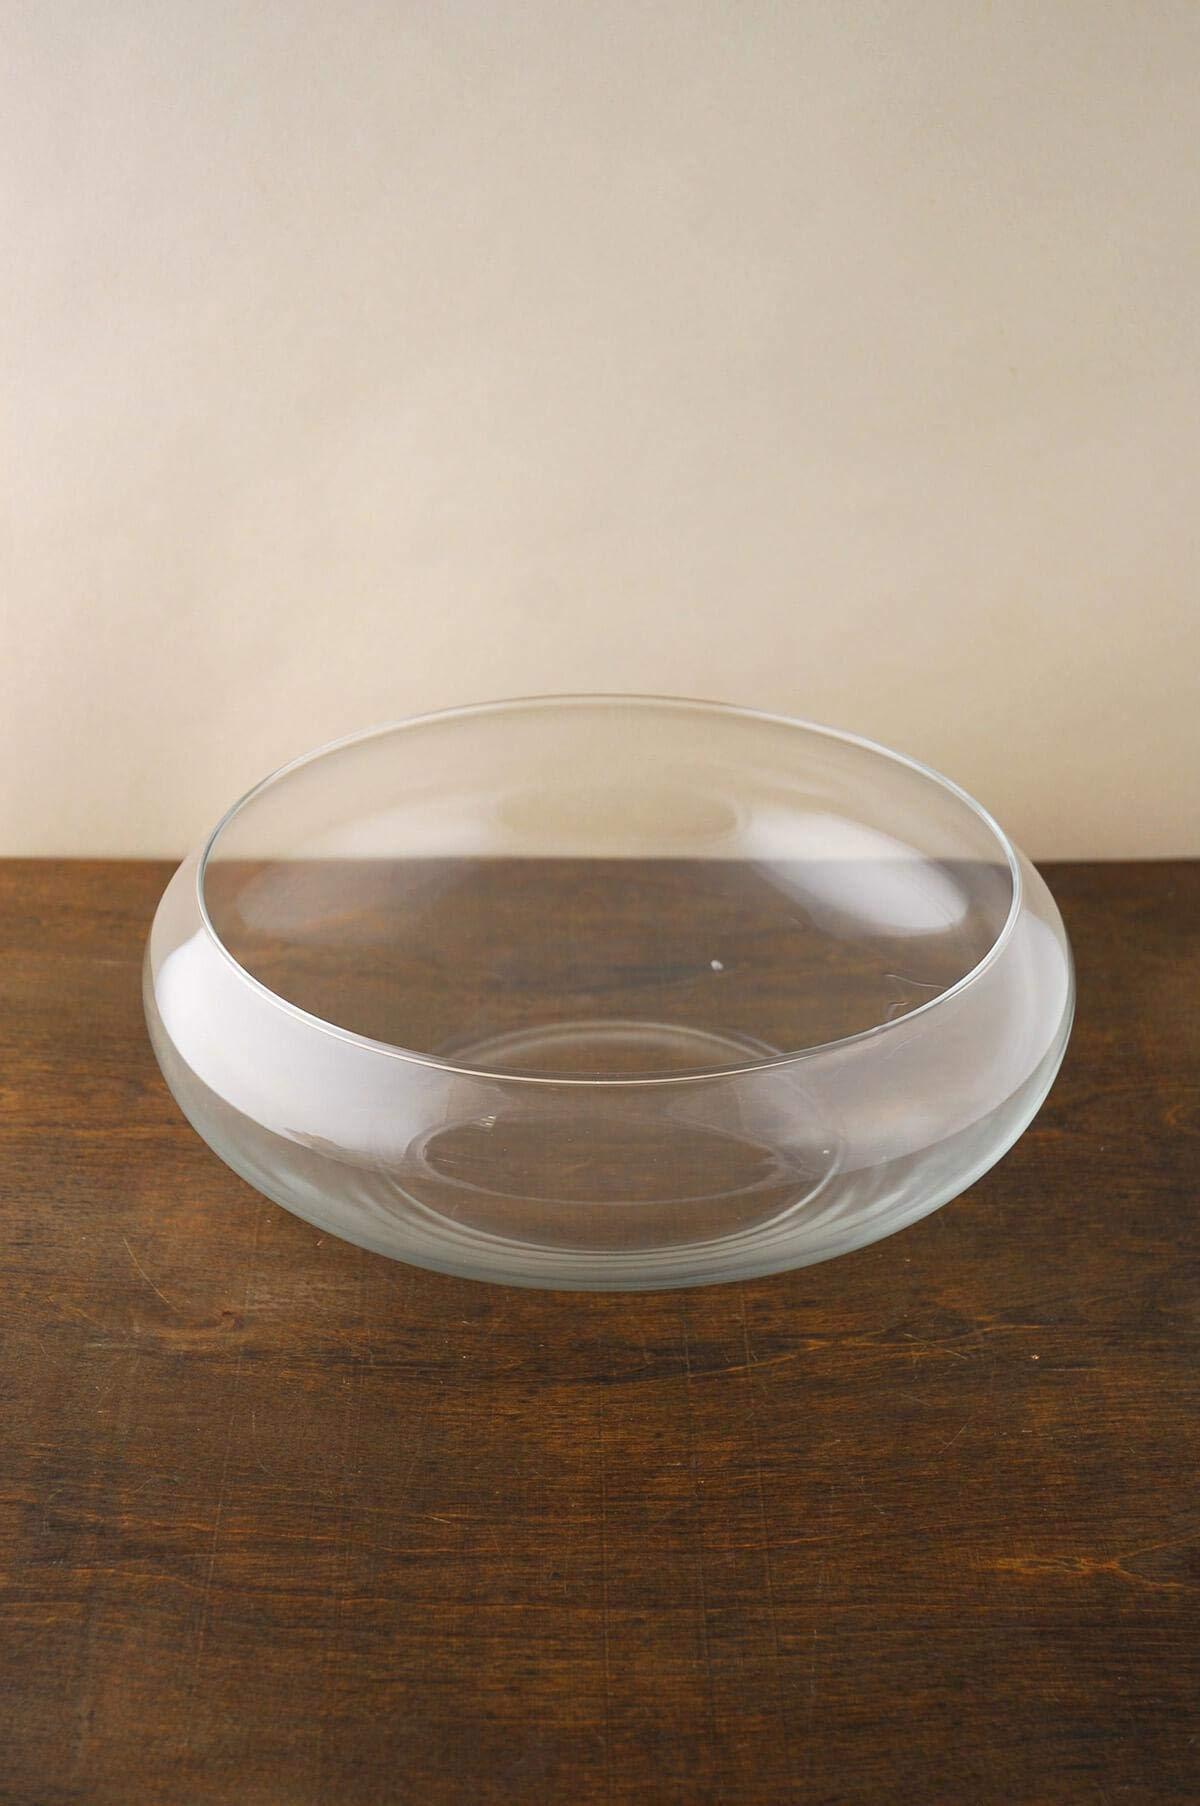 Richland Lily Bowl 12'' Floating Candle Holder Set of 4